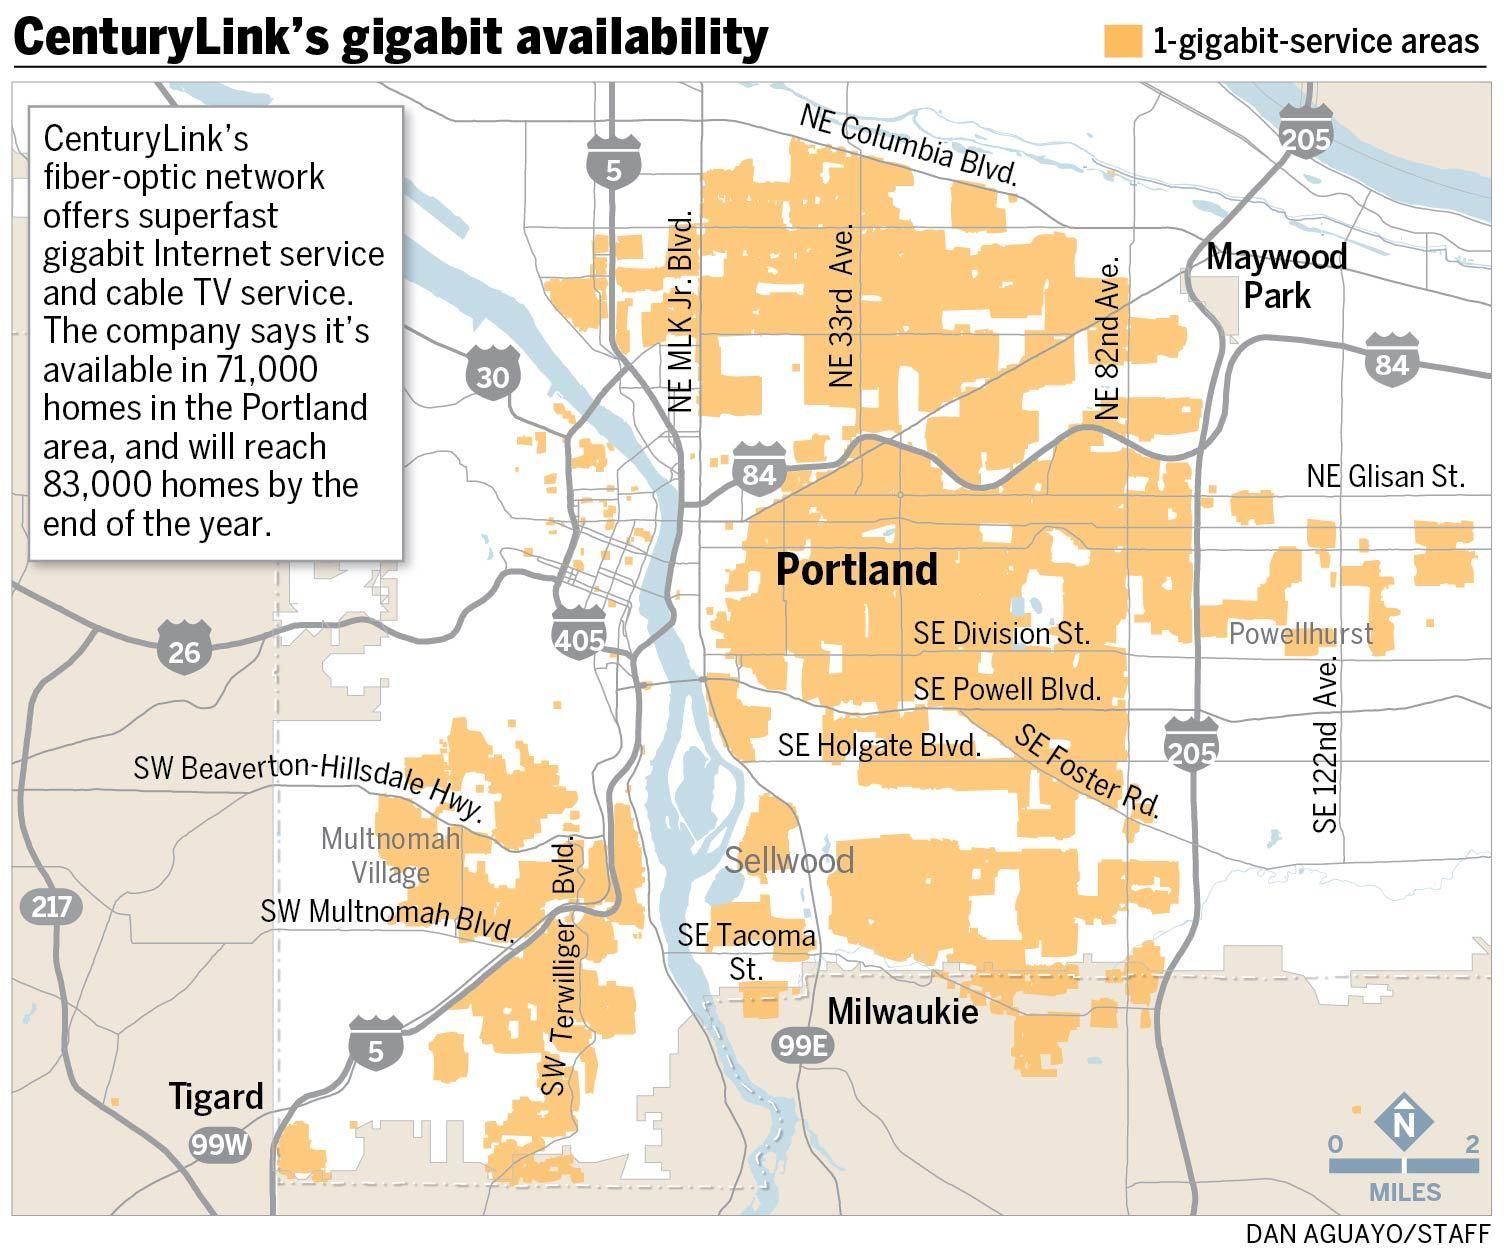 Centurylink Prism Tv Map